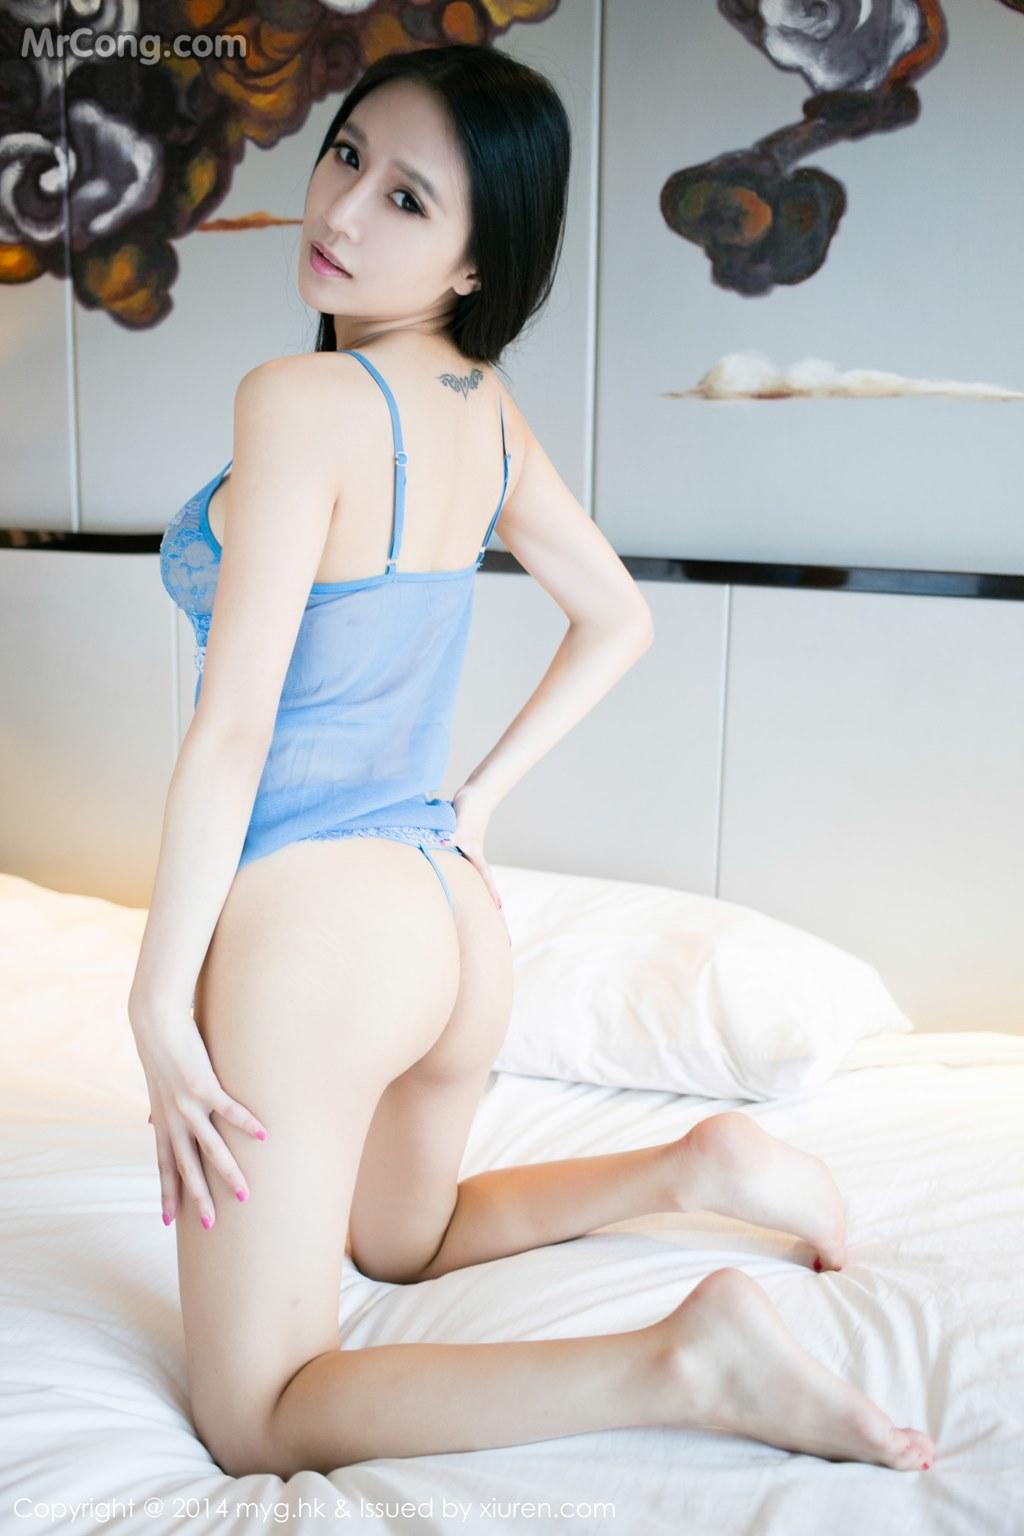 MyGirl Vol.061: Model Yu Da Xiaojie AYU (于大小姐AYU) (55P)